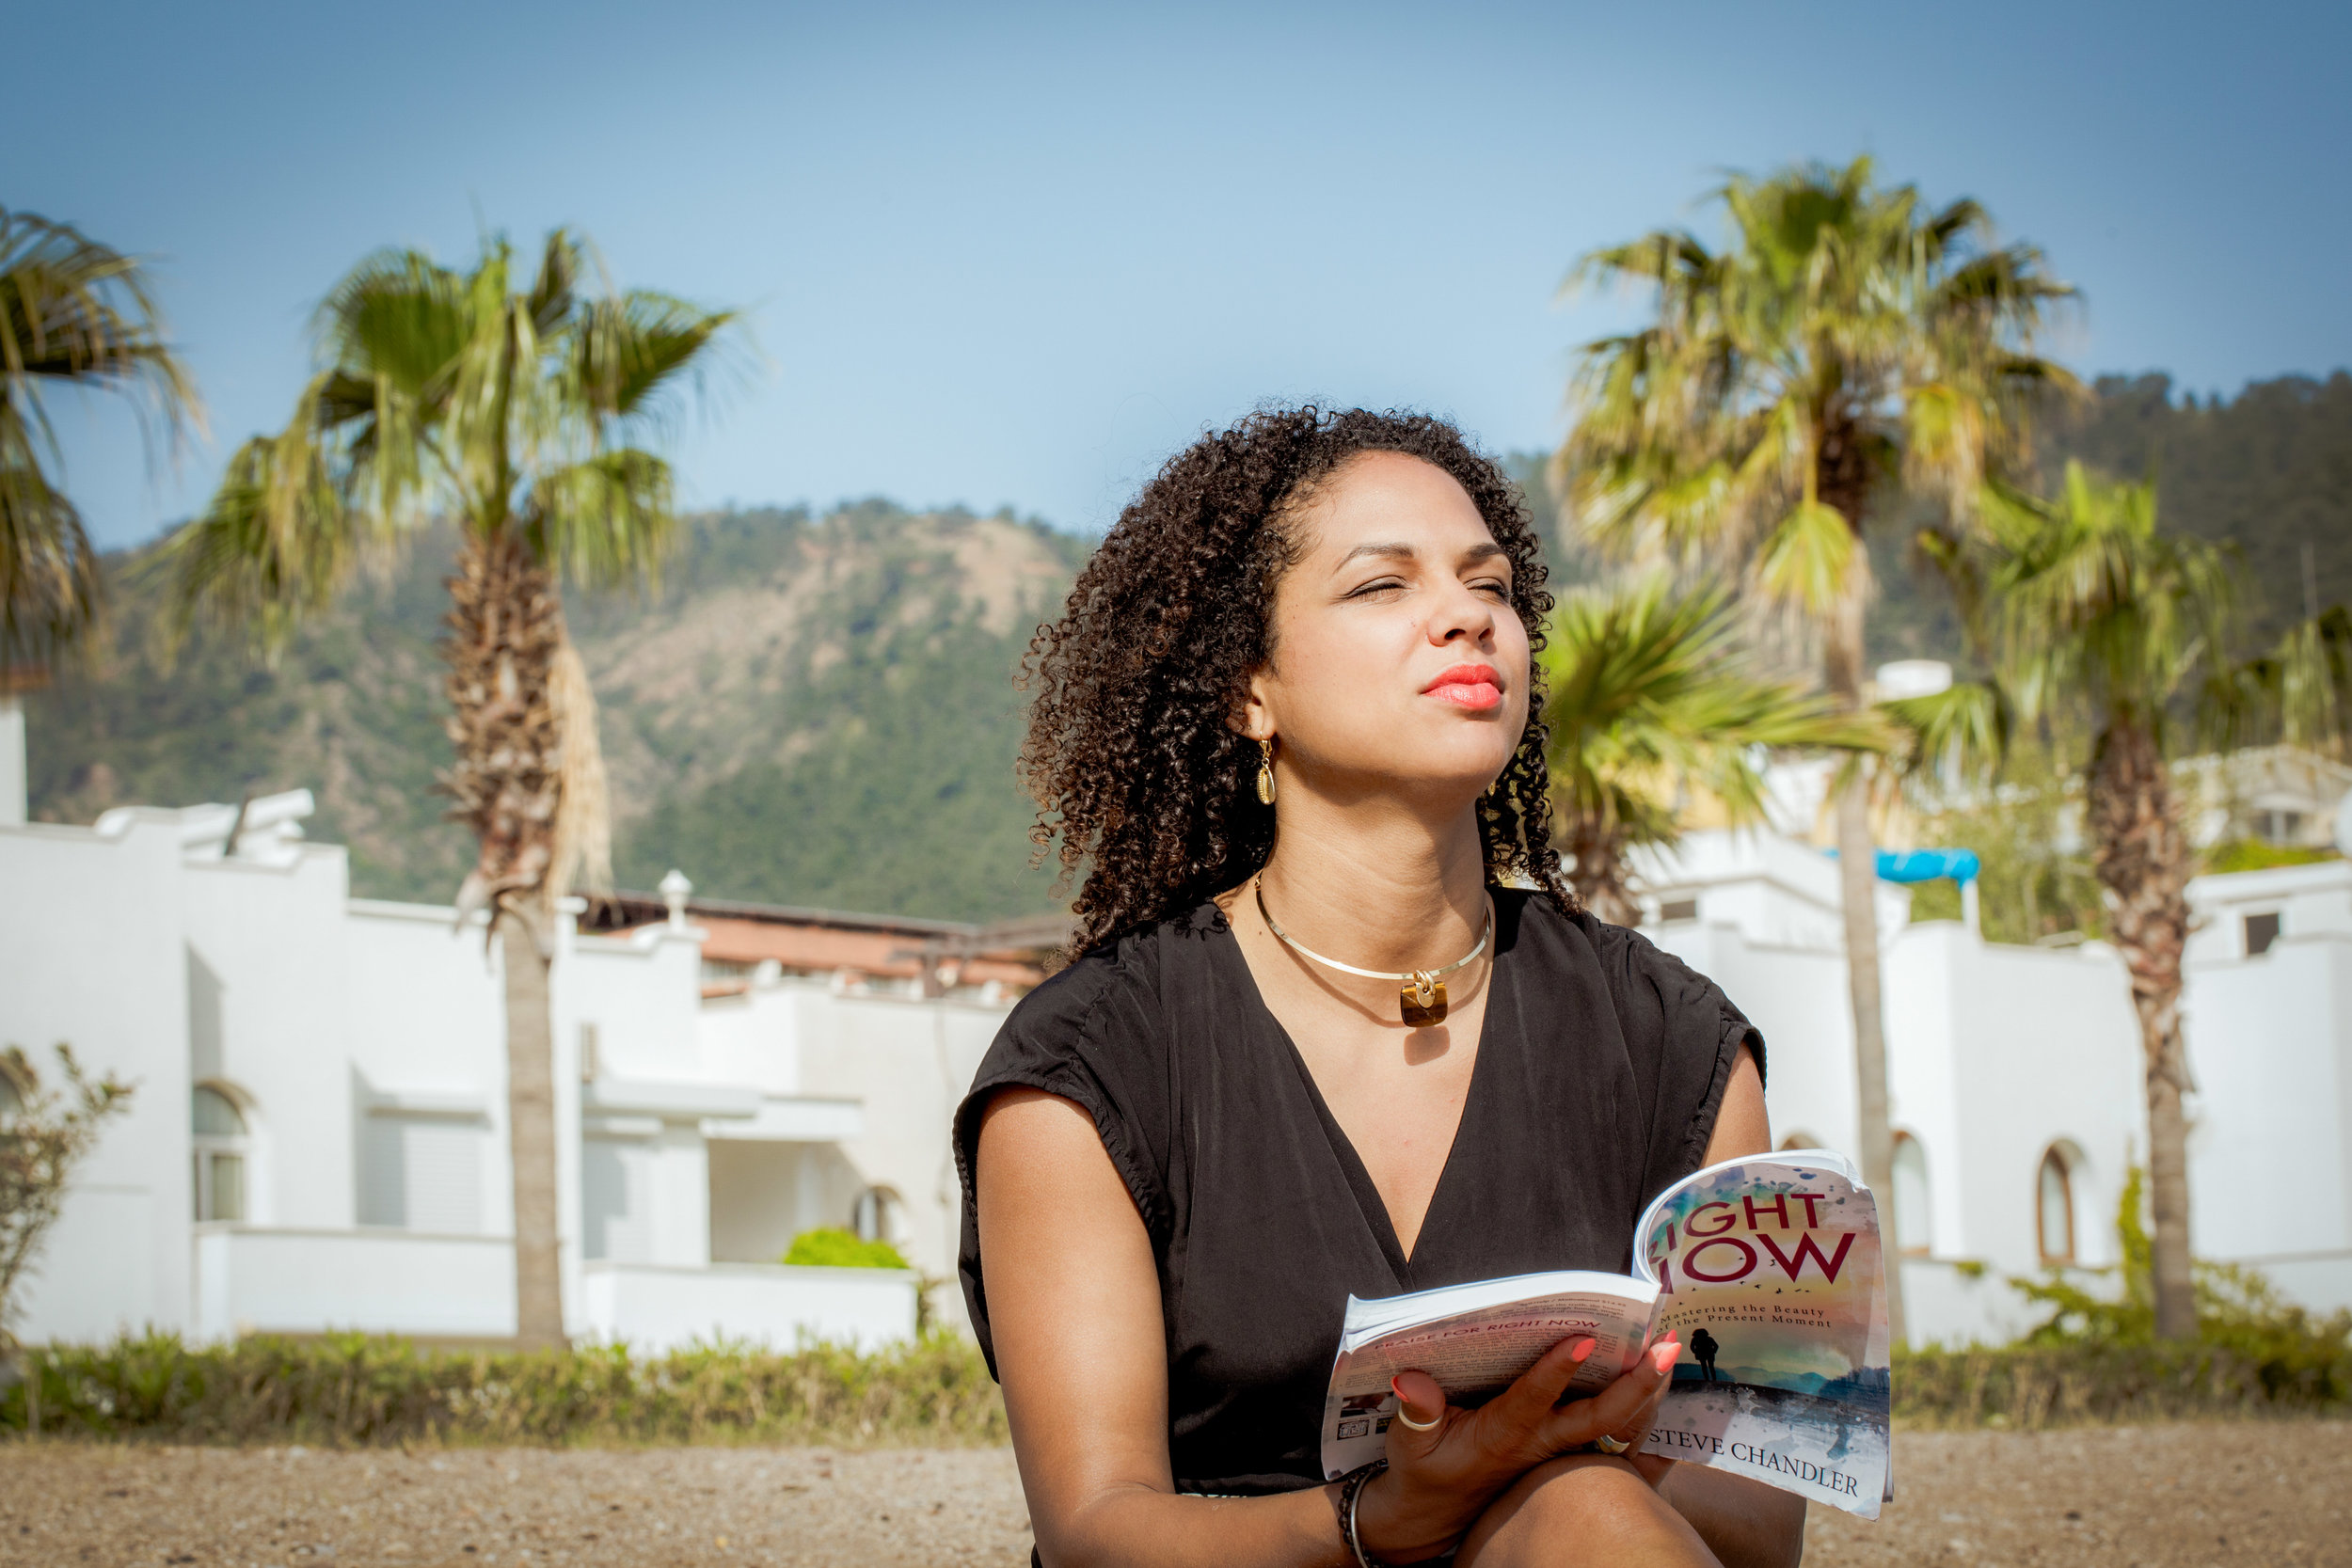 Nancy with book.JPG